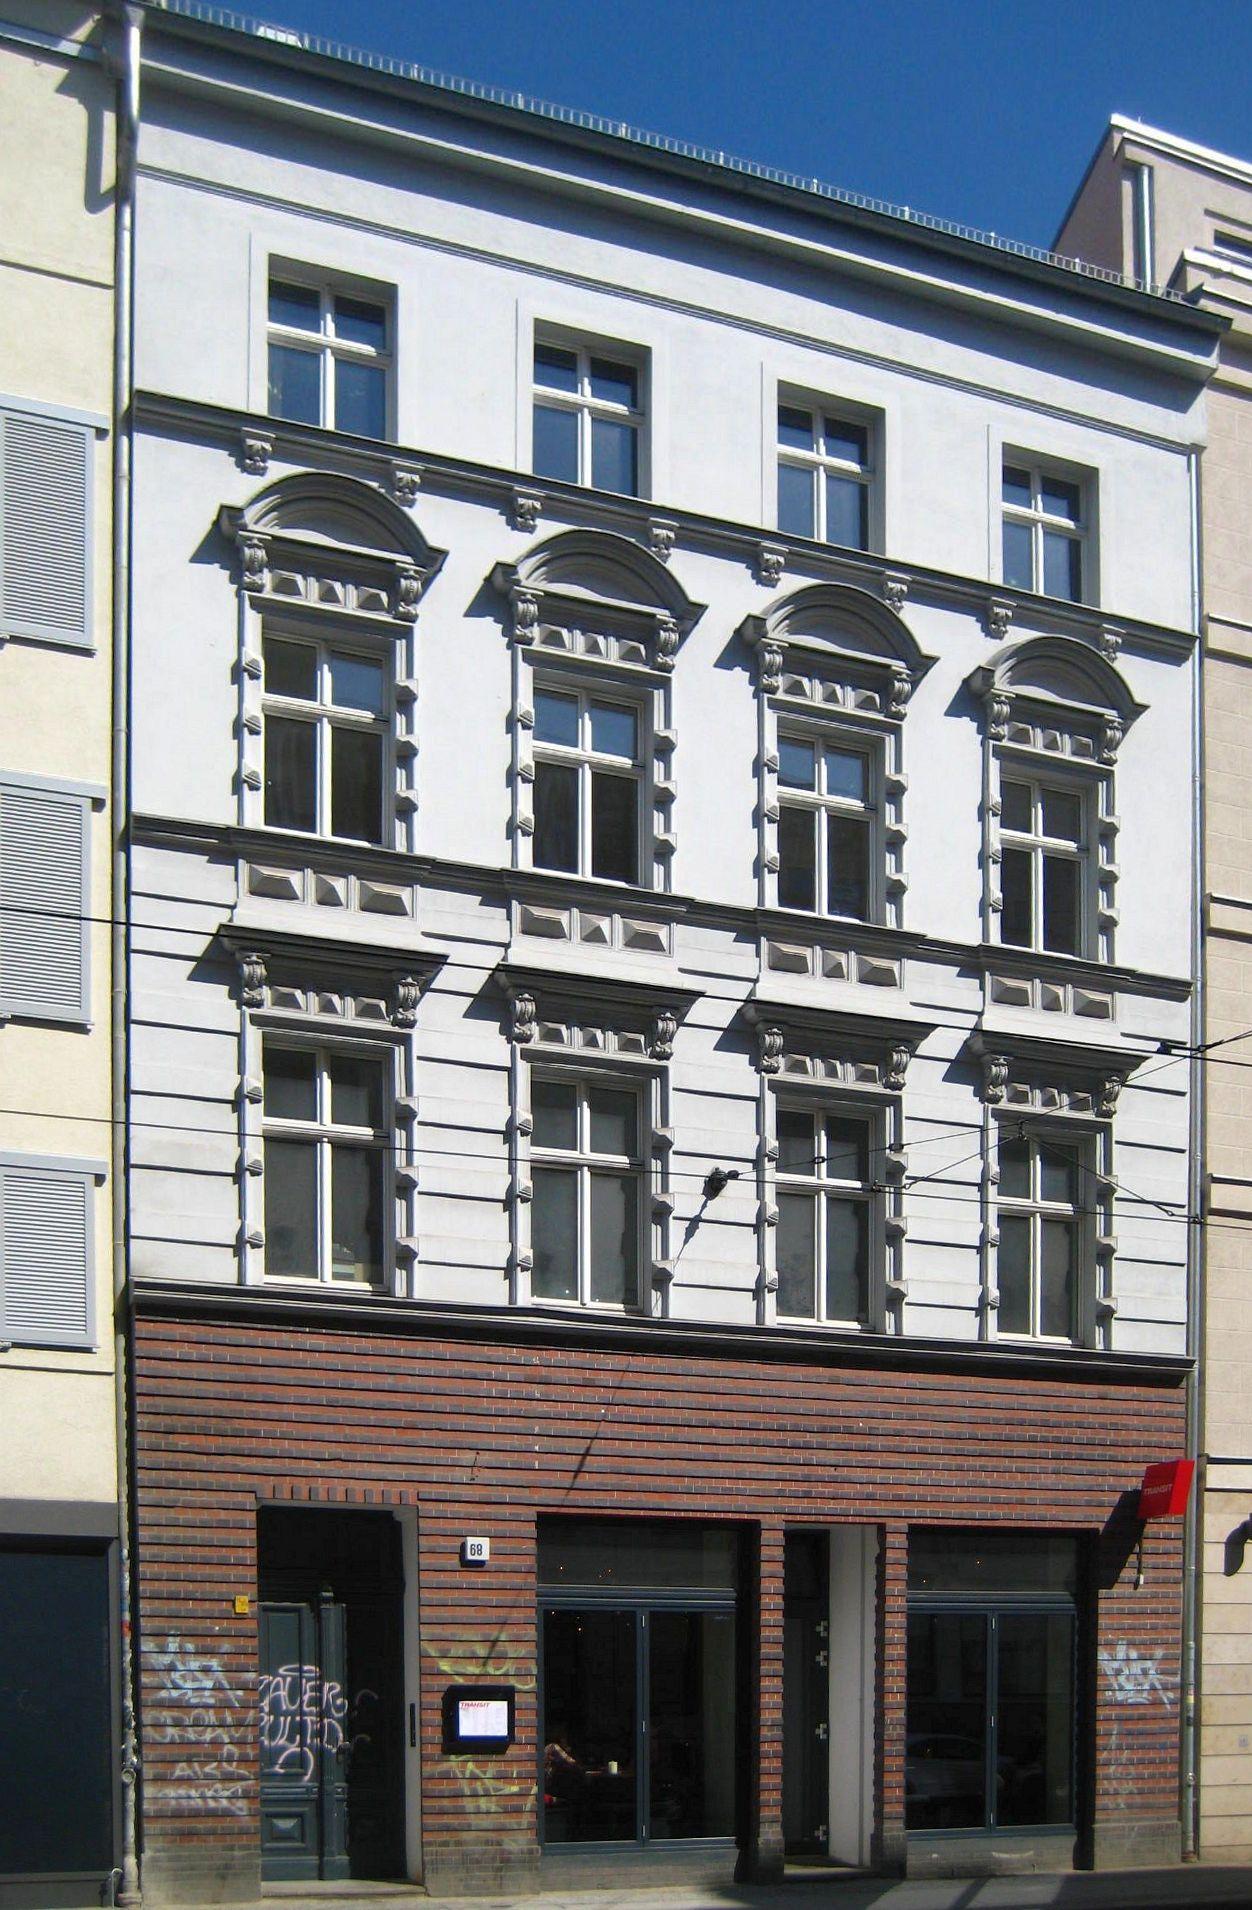 datei berlin mitte rosenthaler strasse 68 wikipedia. Black Bedroom Furniture Sets. Home Design Ideas